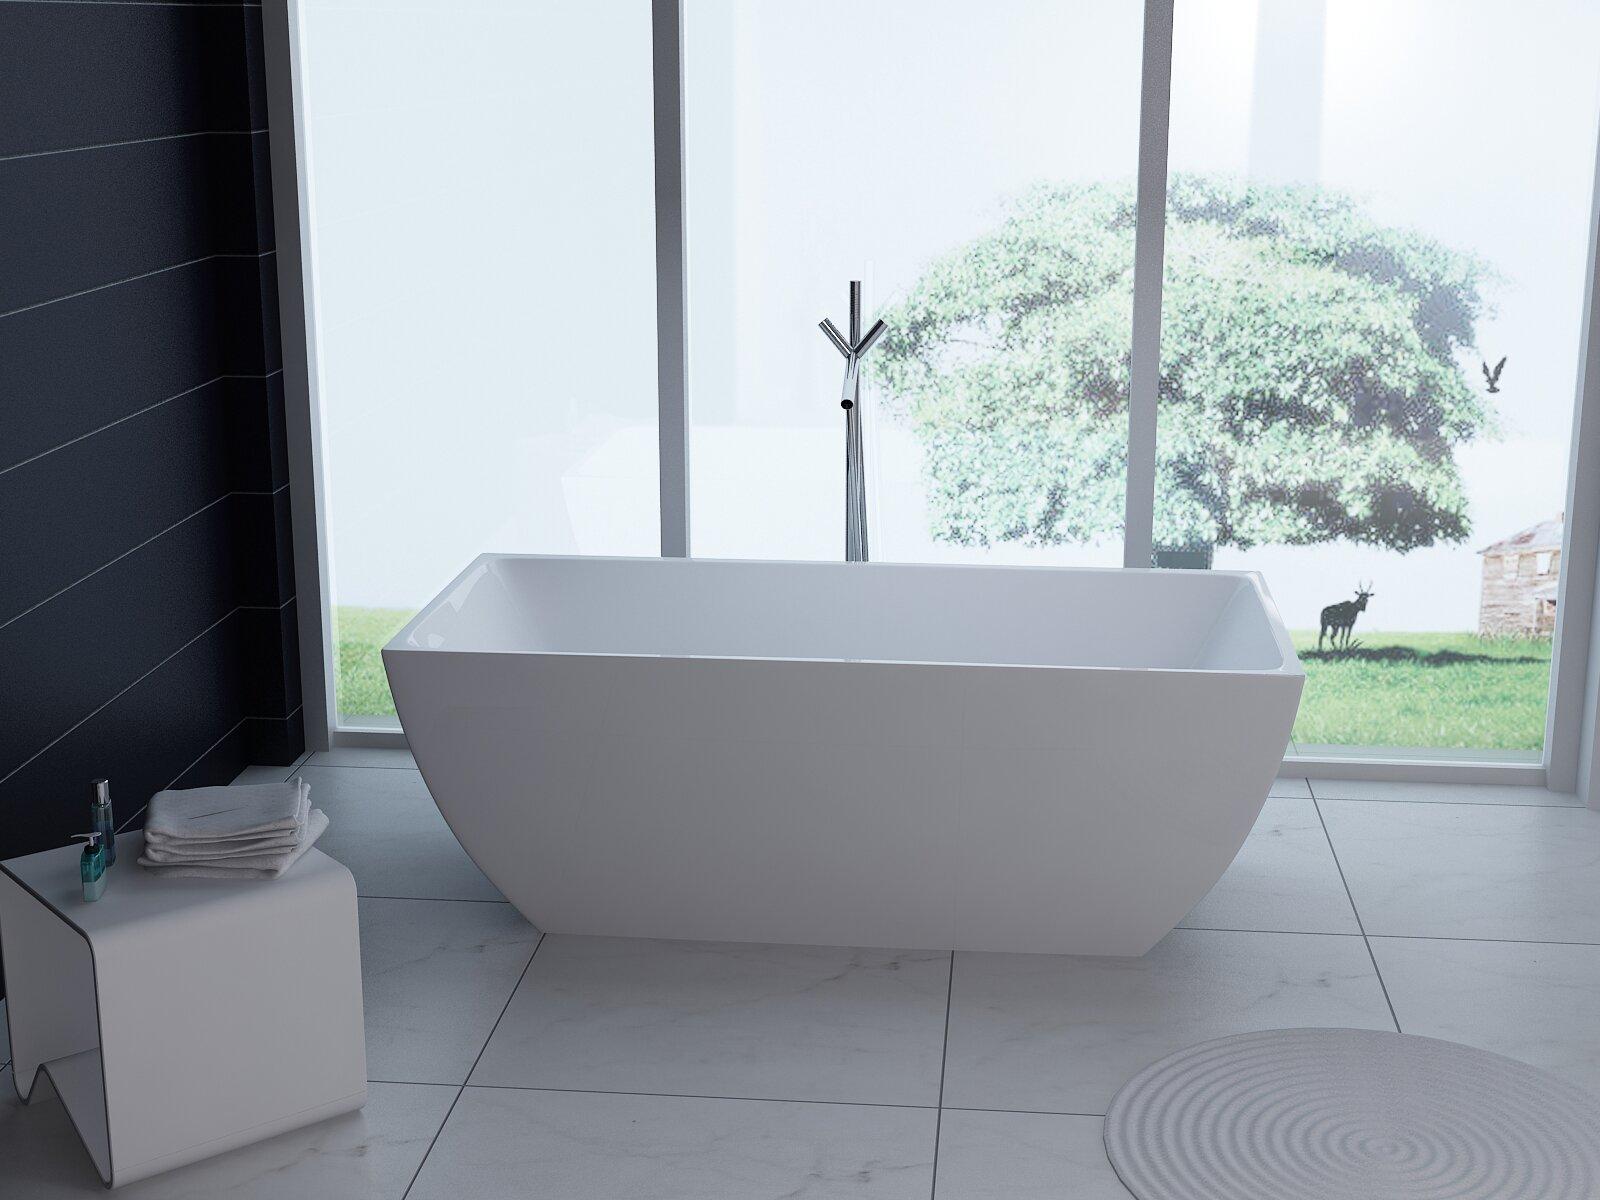 Vasca Da Bagno Freestanding In Acrilico : Mitepek vasca da bagno freestanding in acrilico cm